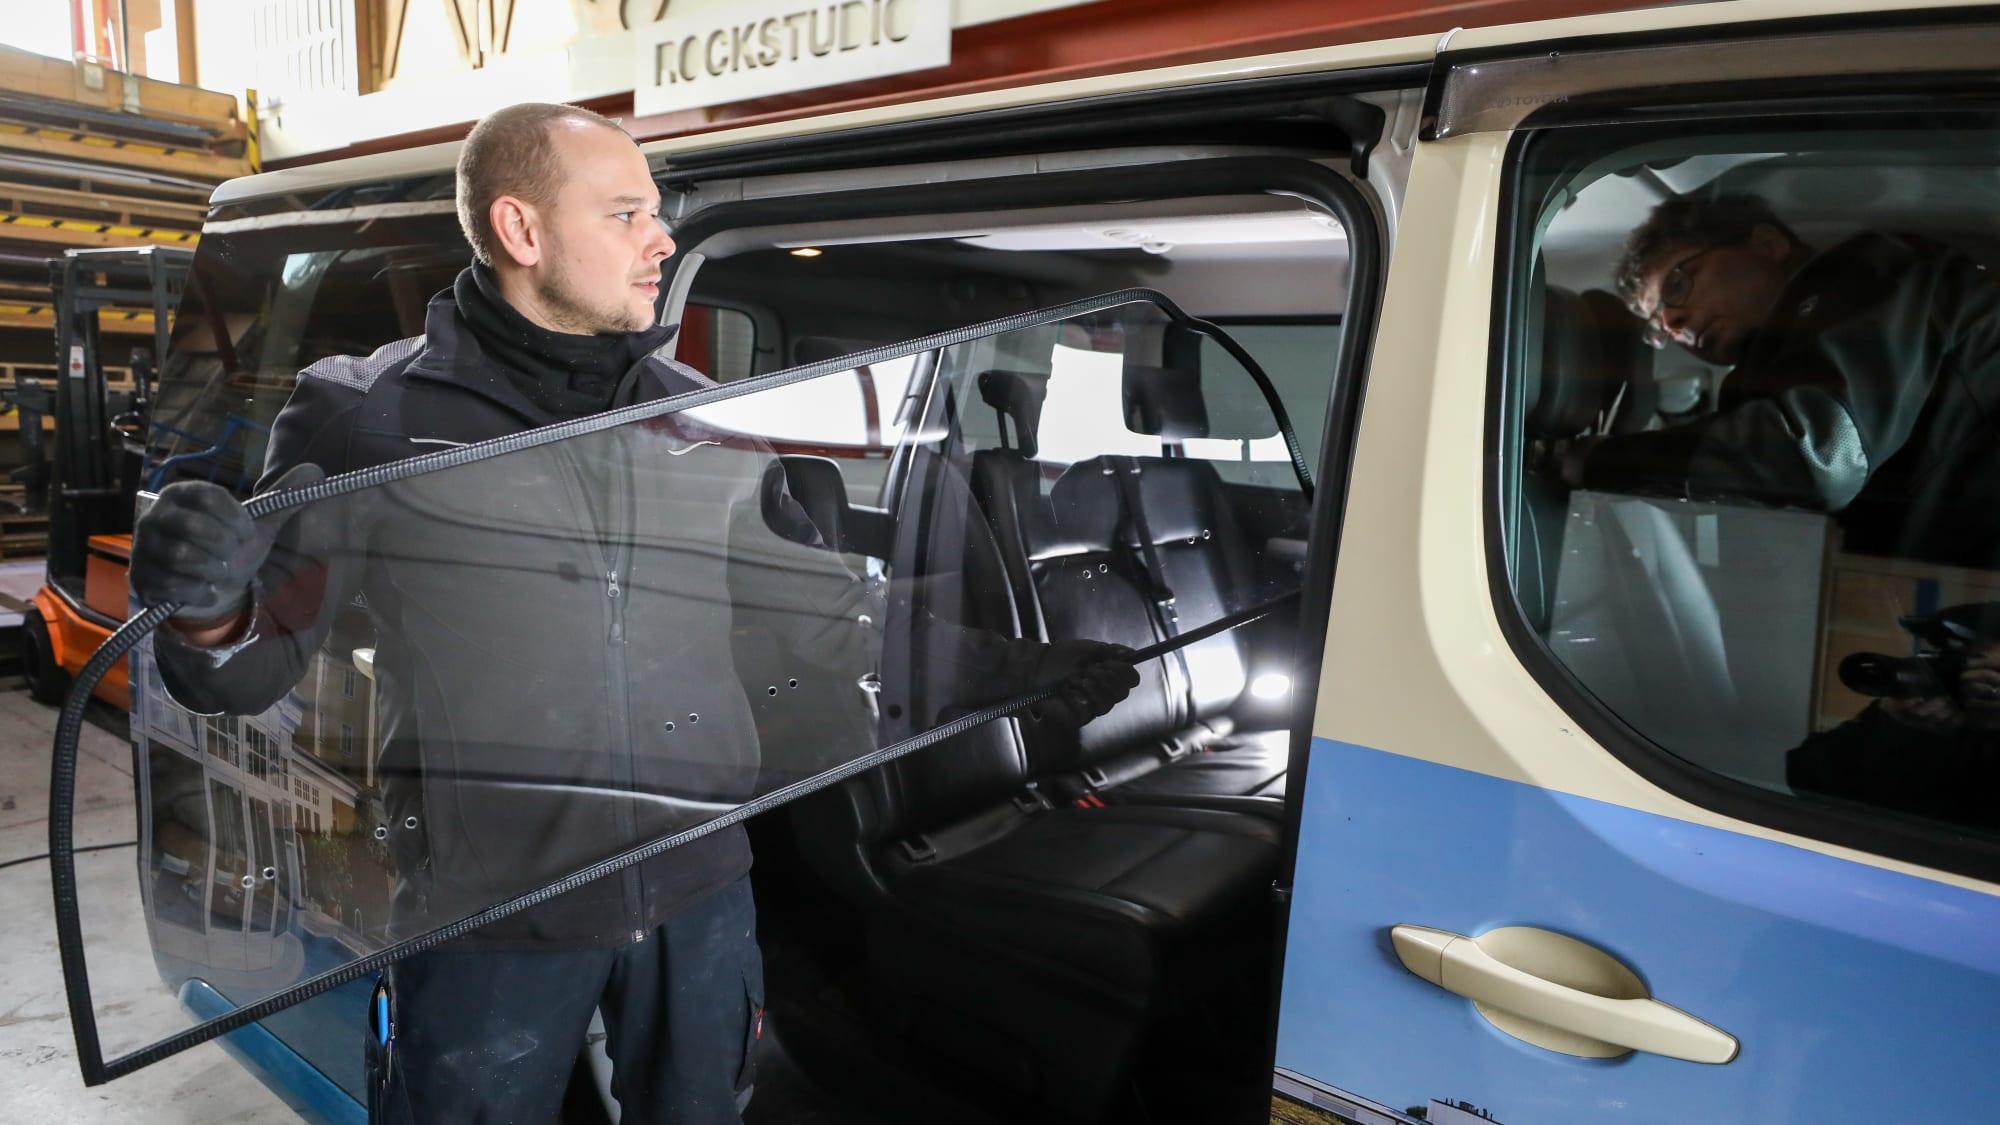 Coronavirus: Innenraum-Abtrennung im Taxi gefährlich? | ADAC